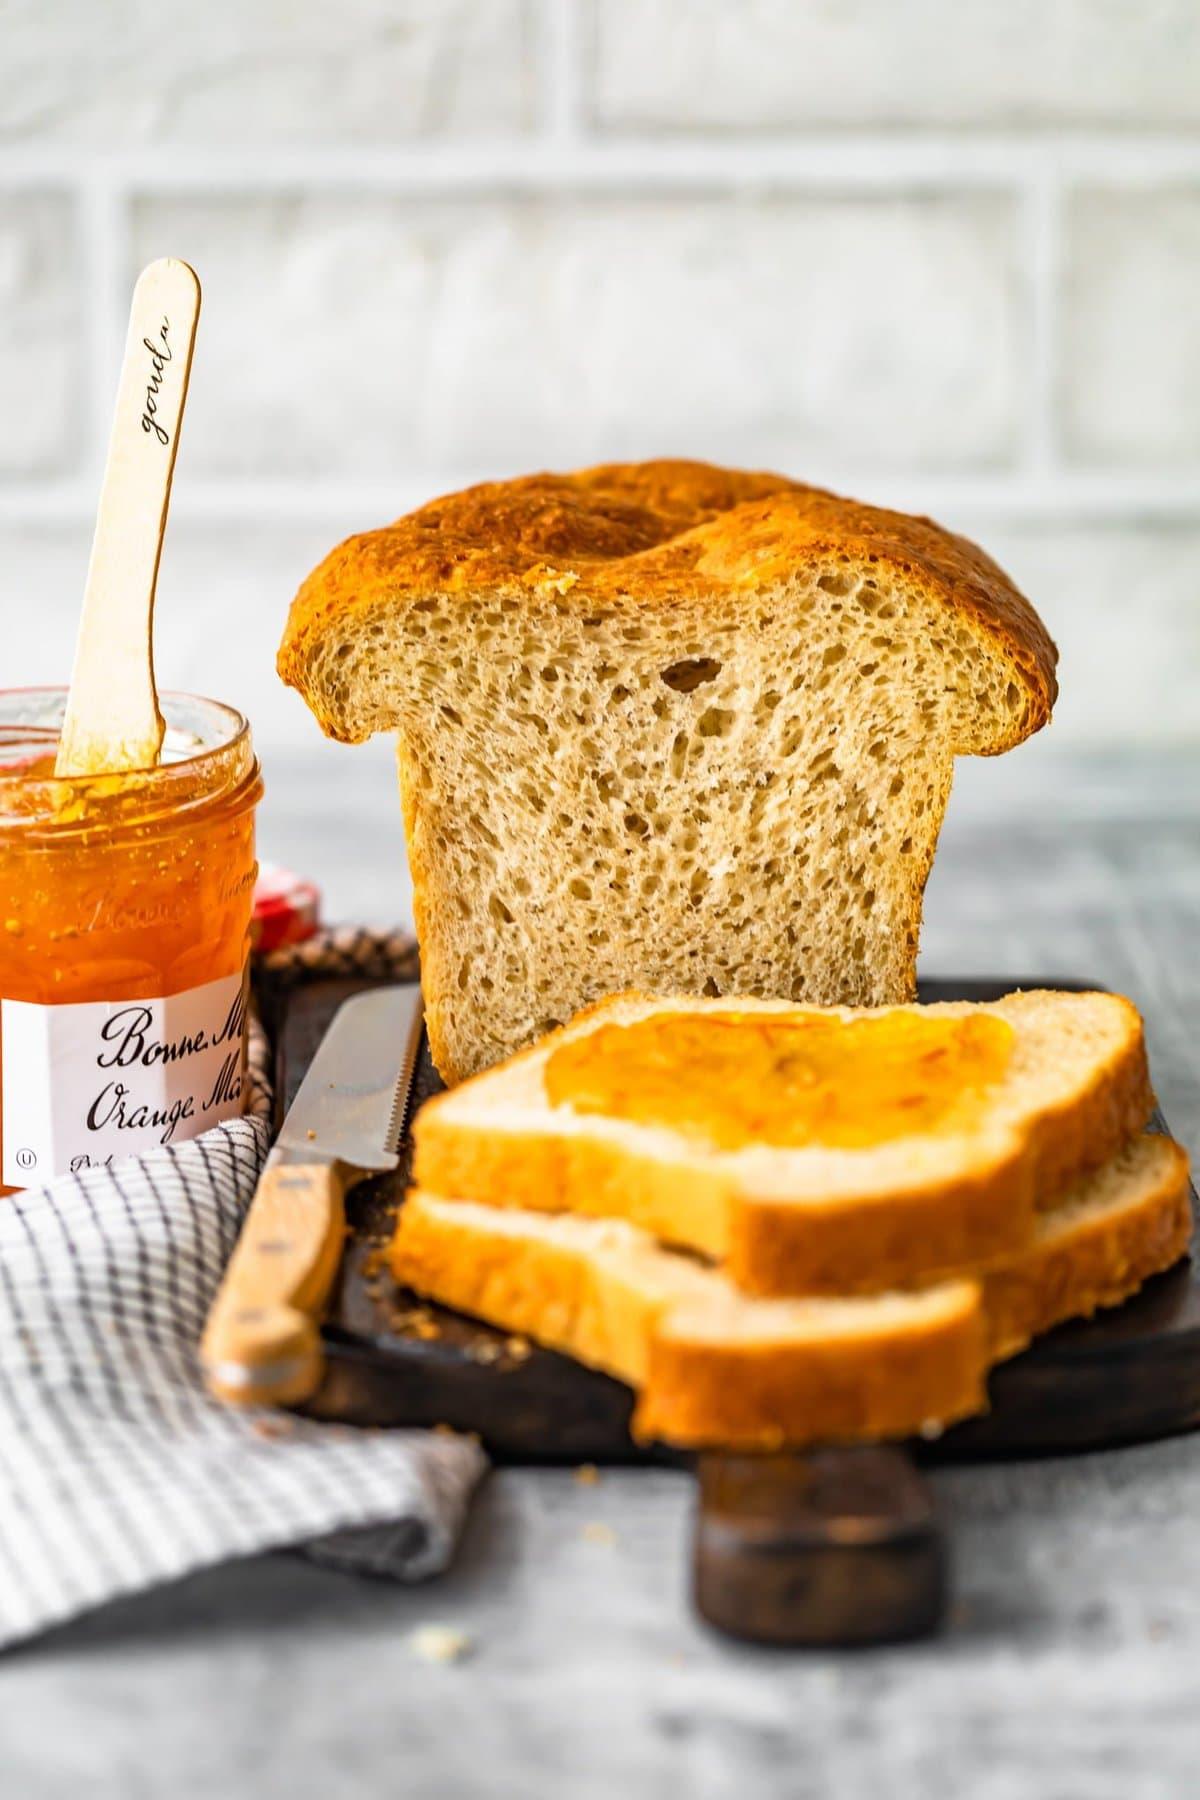 sandwich bread next to a jar of marmalade